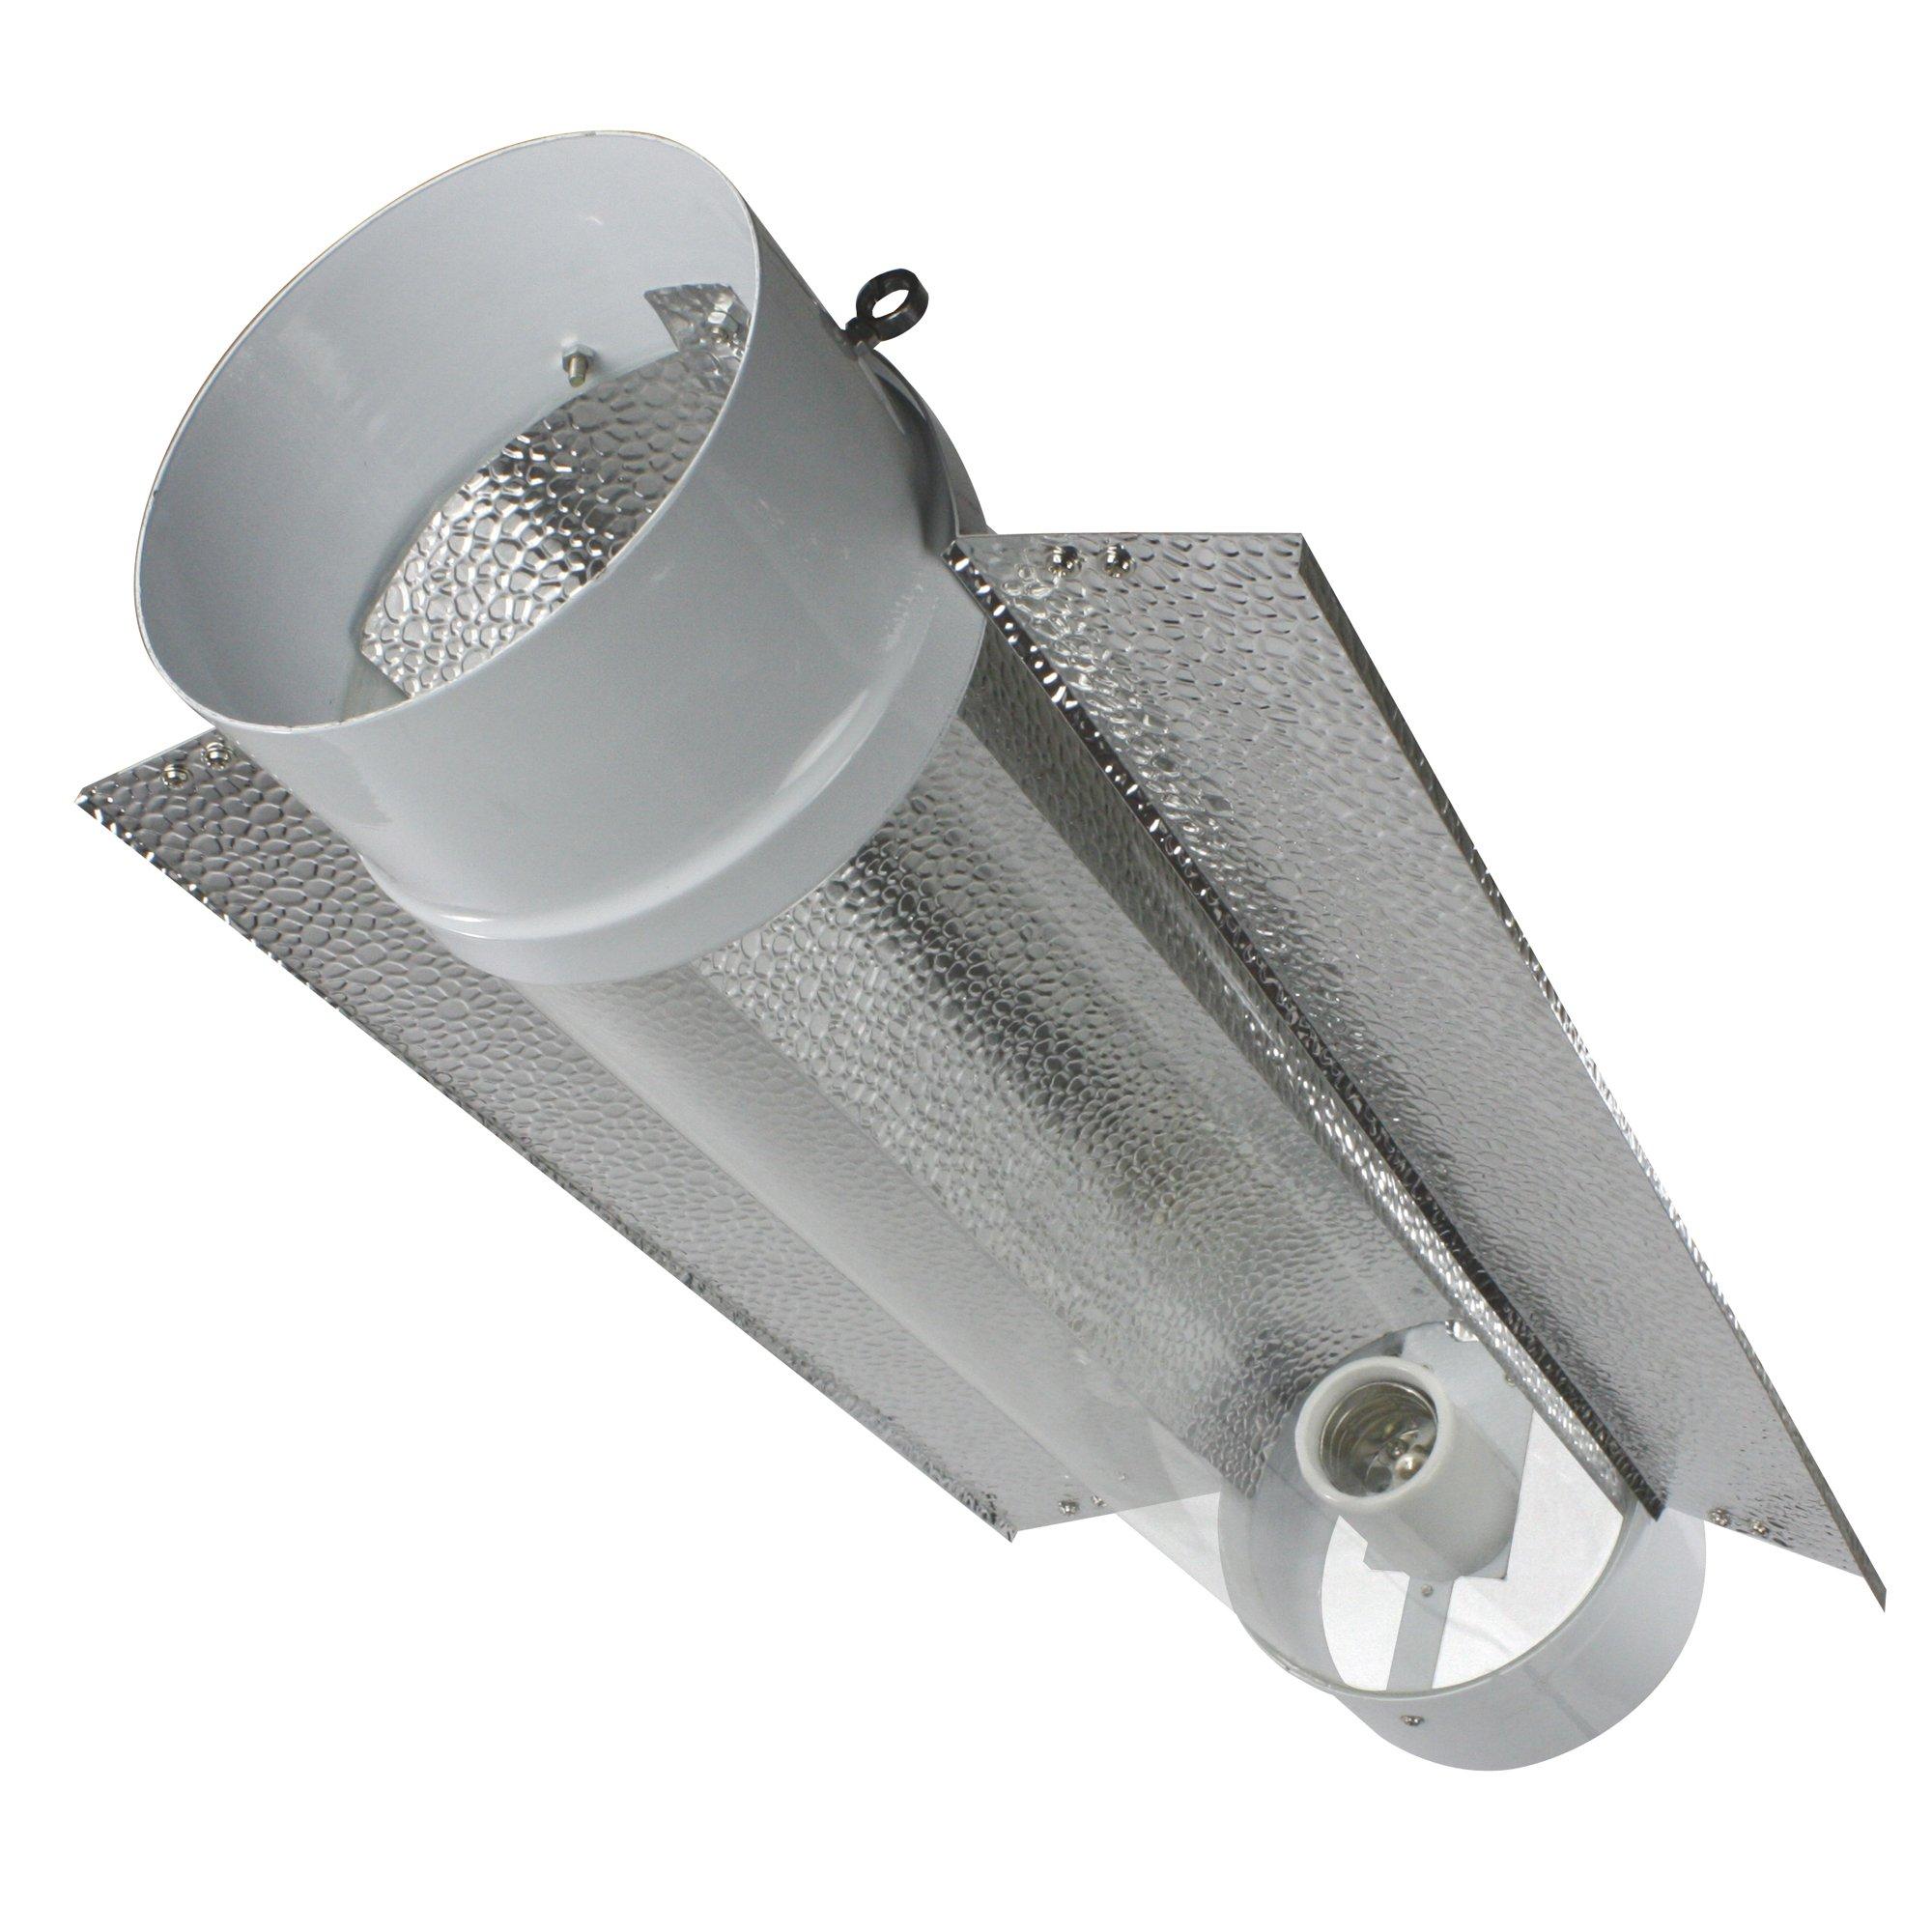 ViaVolt Air Cooled Grow Light Reflector, 6'' x 24''